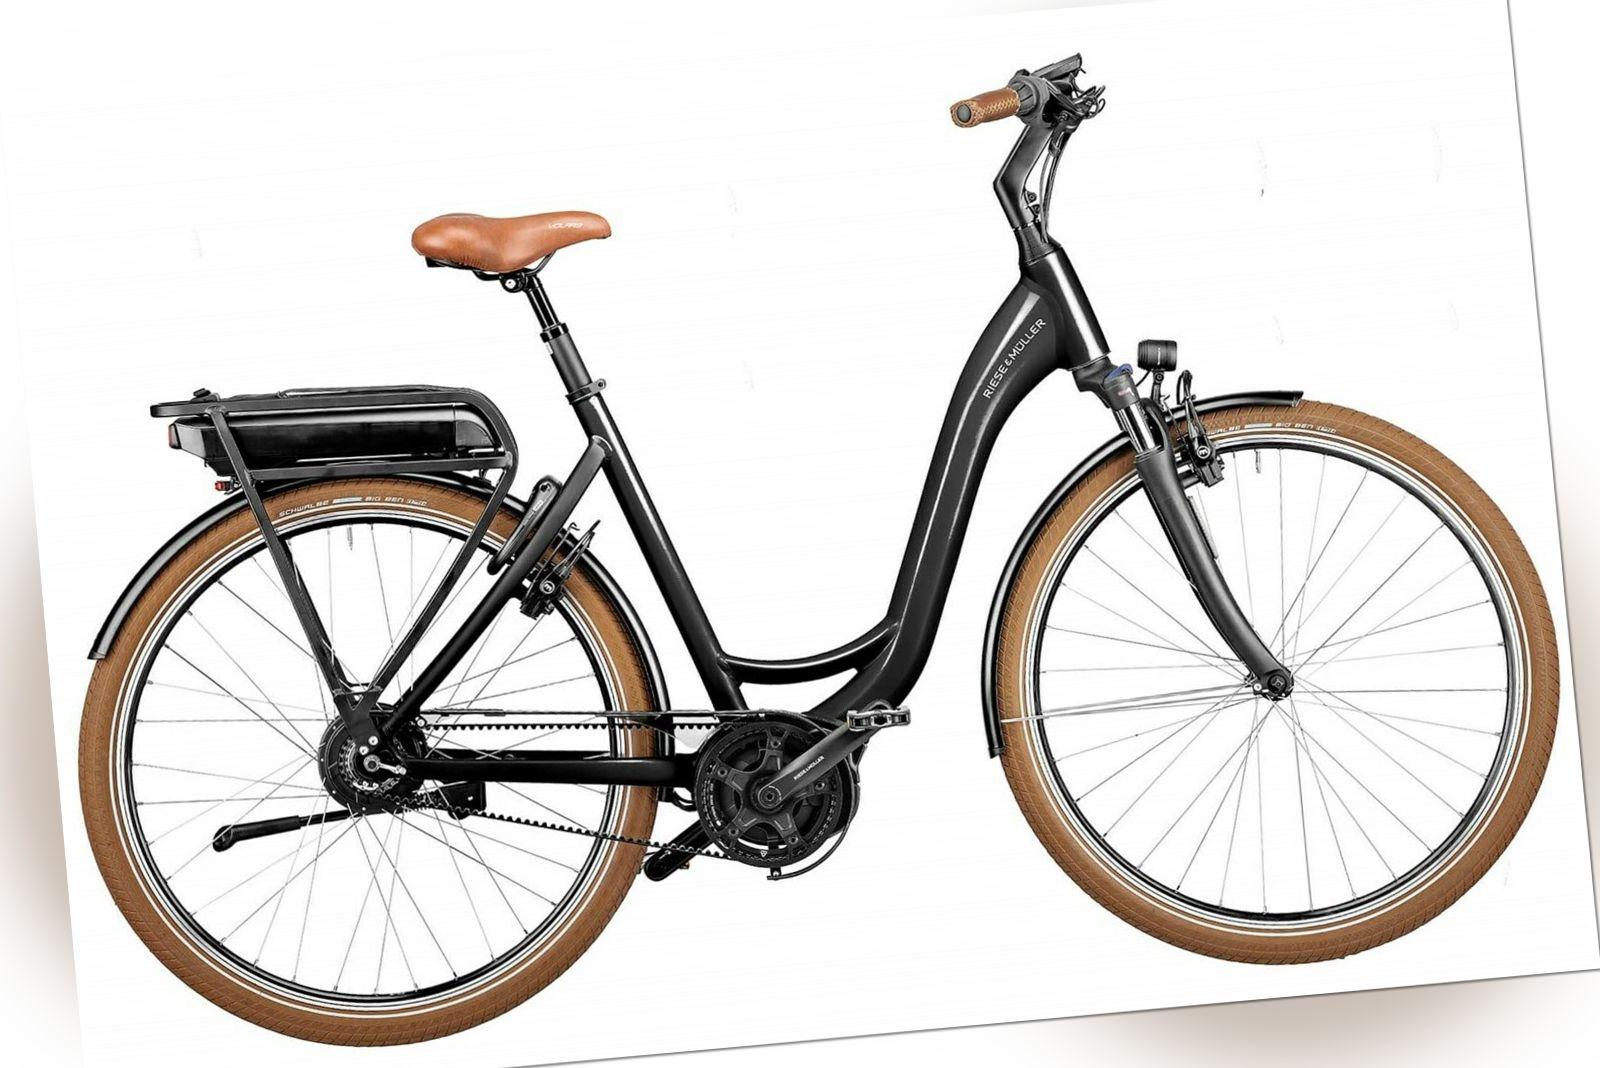 Riese & Müller Swing3 Vario Urban 500 Wh City E-Bike Pedelec Bosch Performance